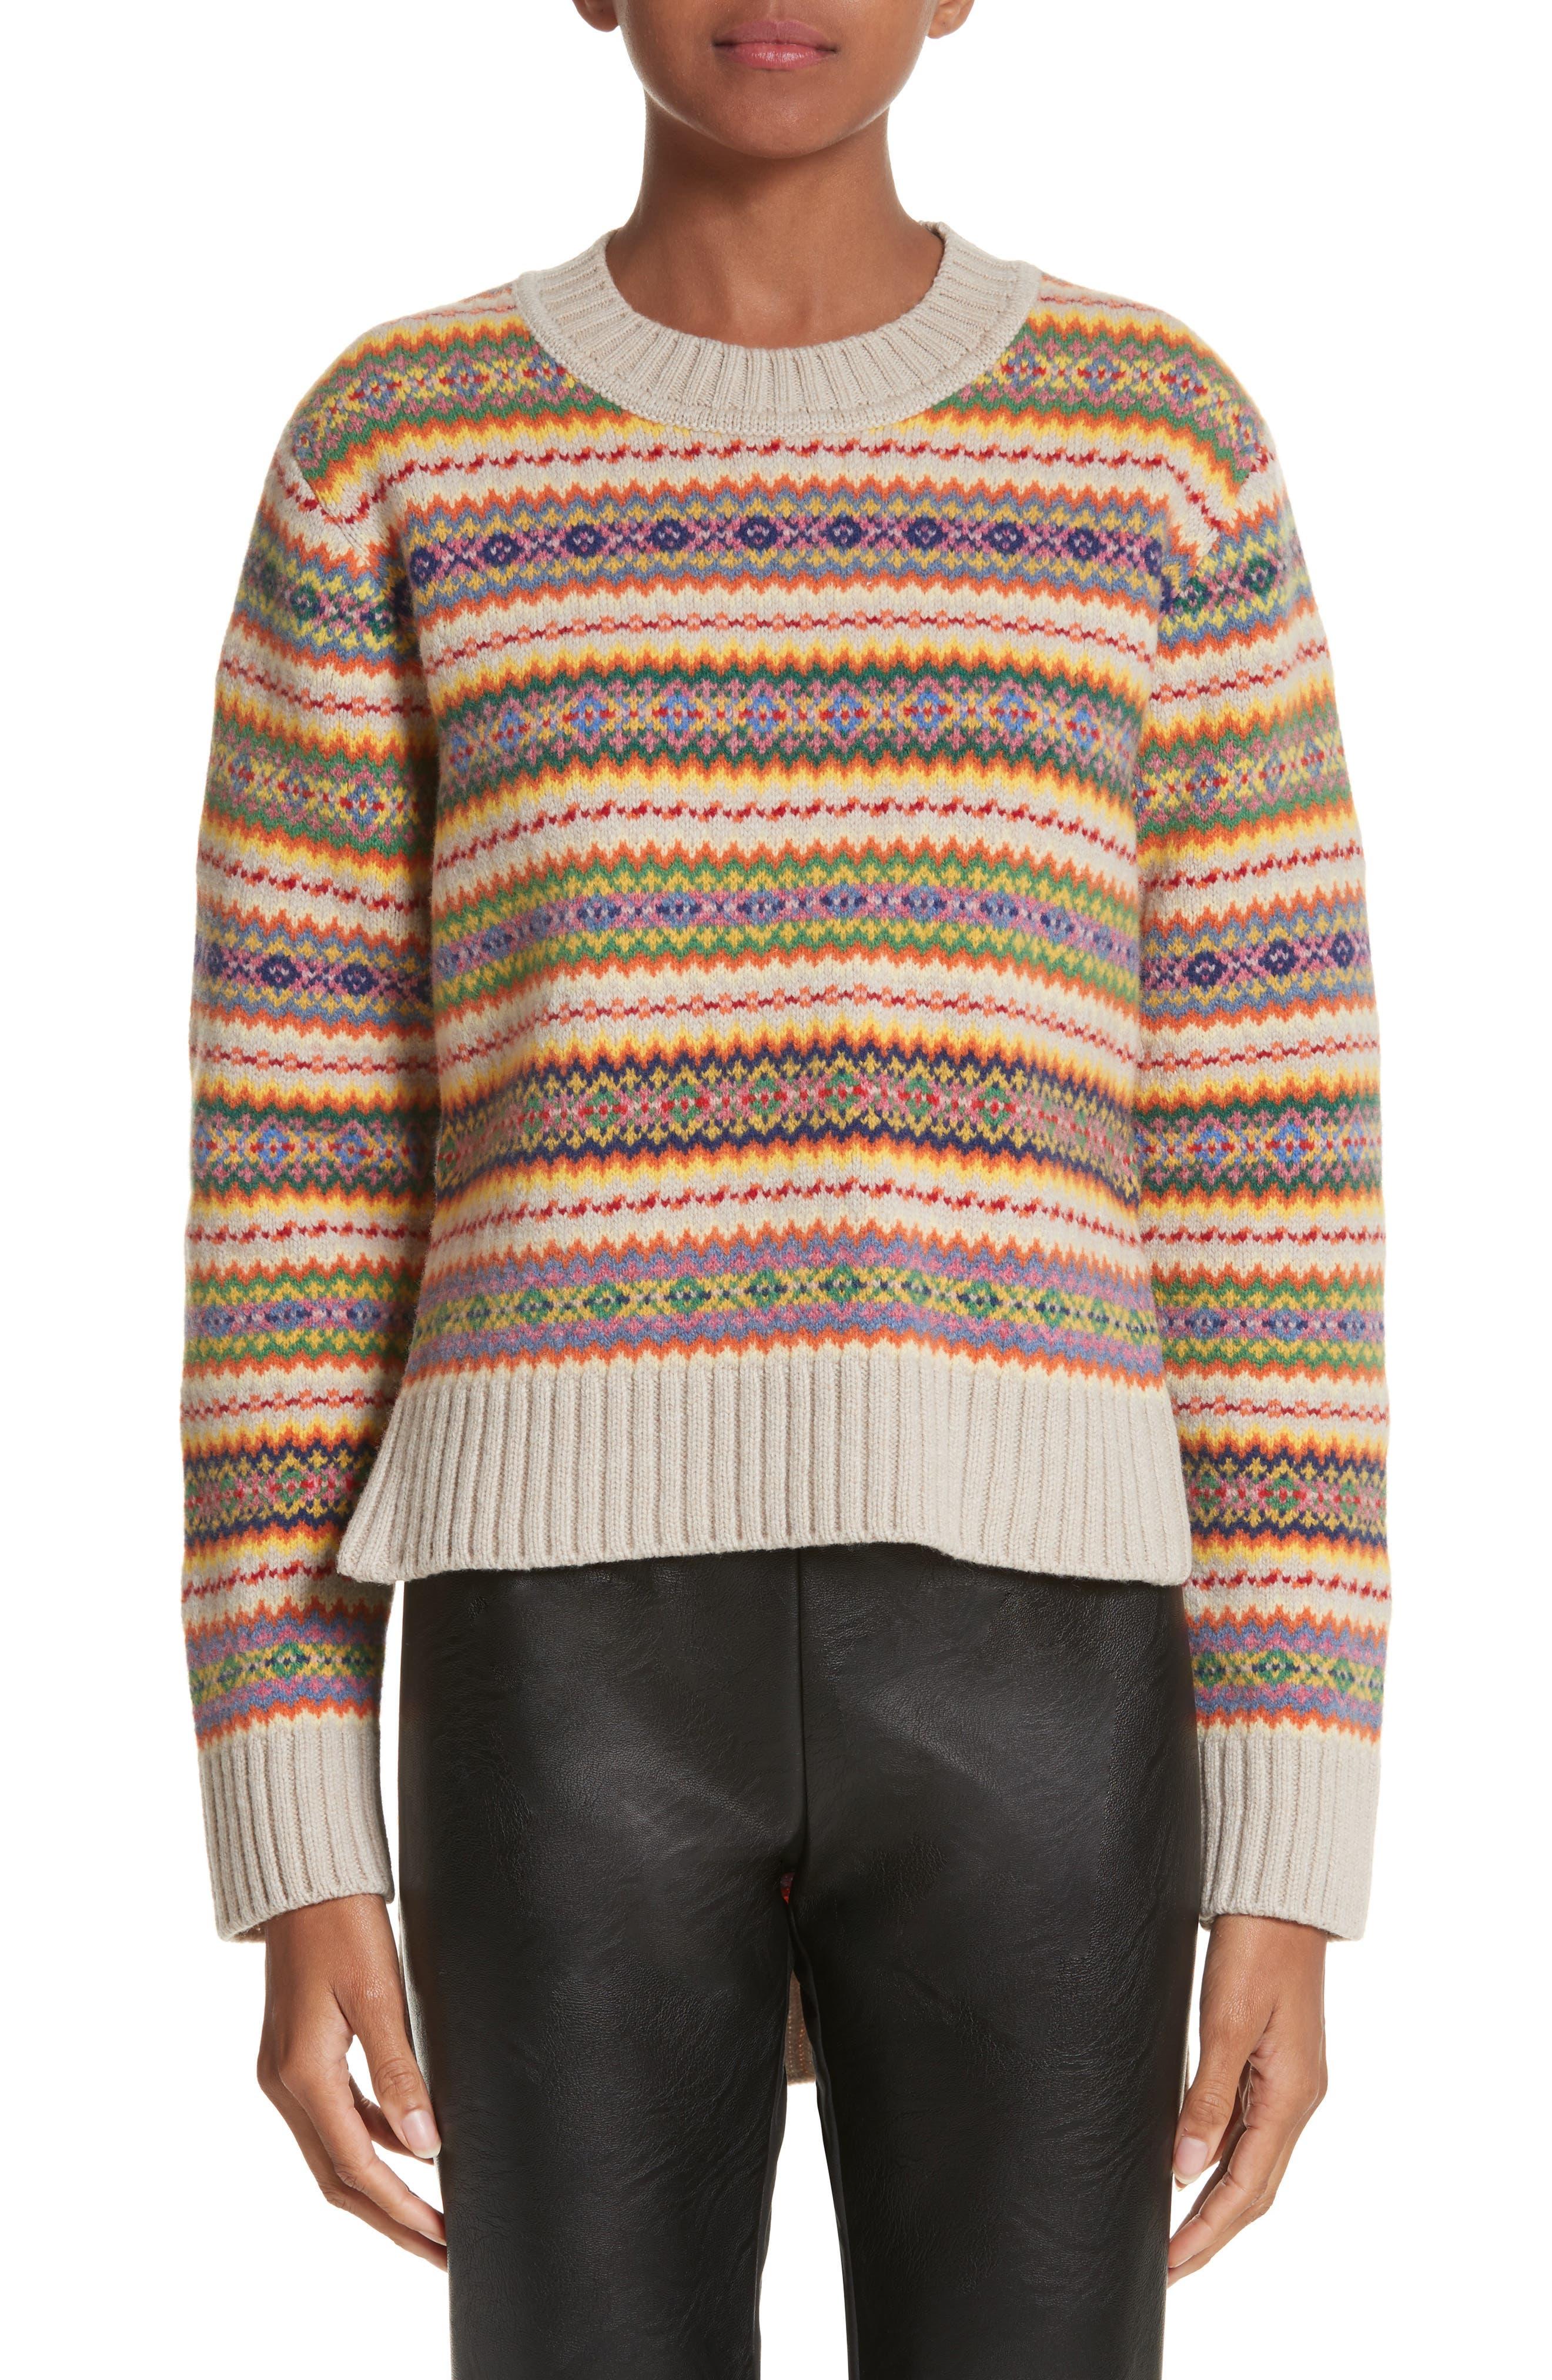 Shetland Wool Fair Isle Sweater,                         Main,                         color, Multicolor